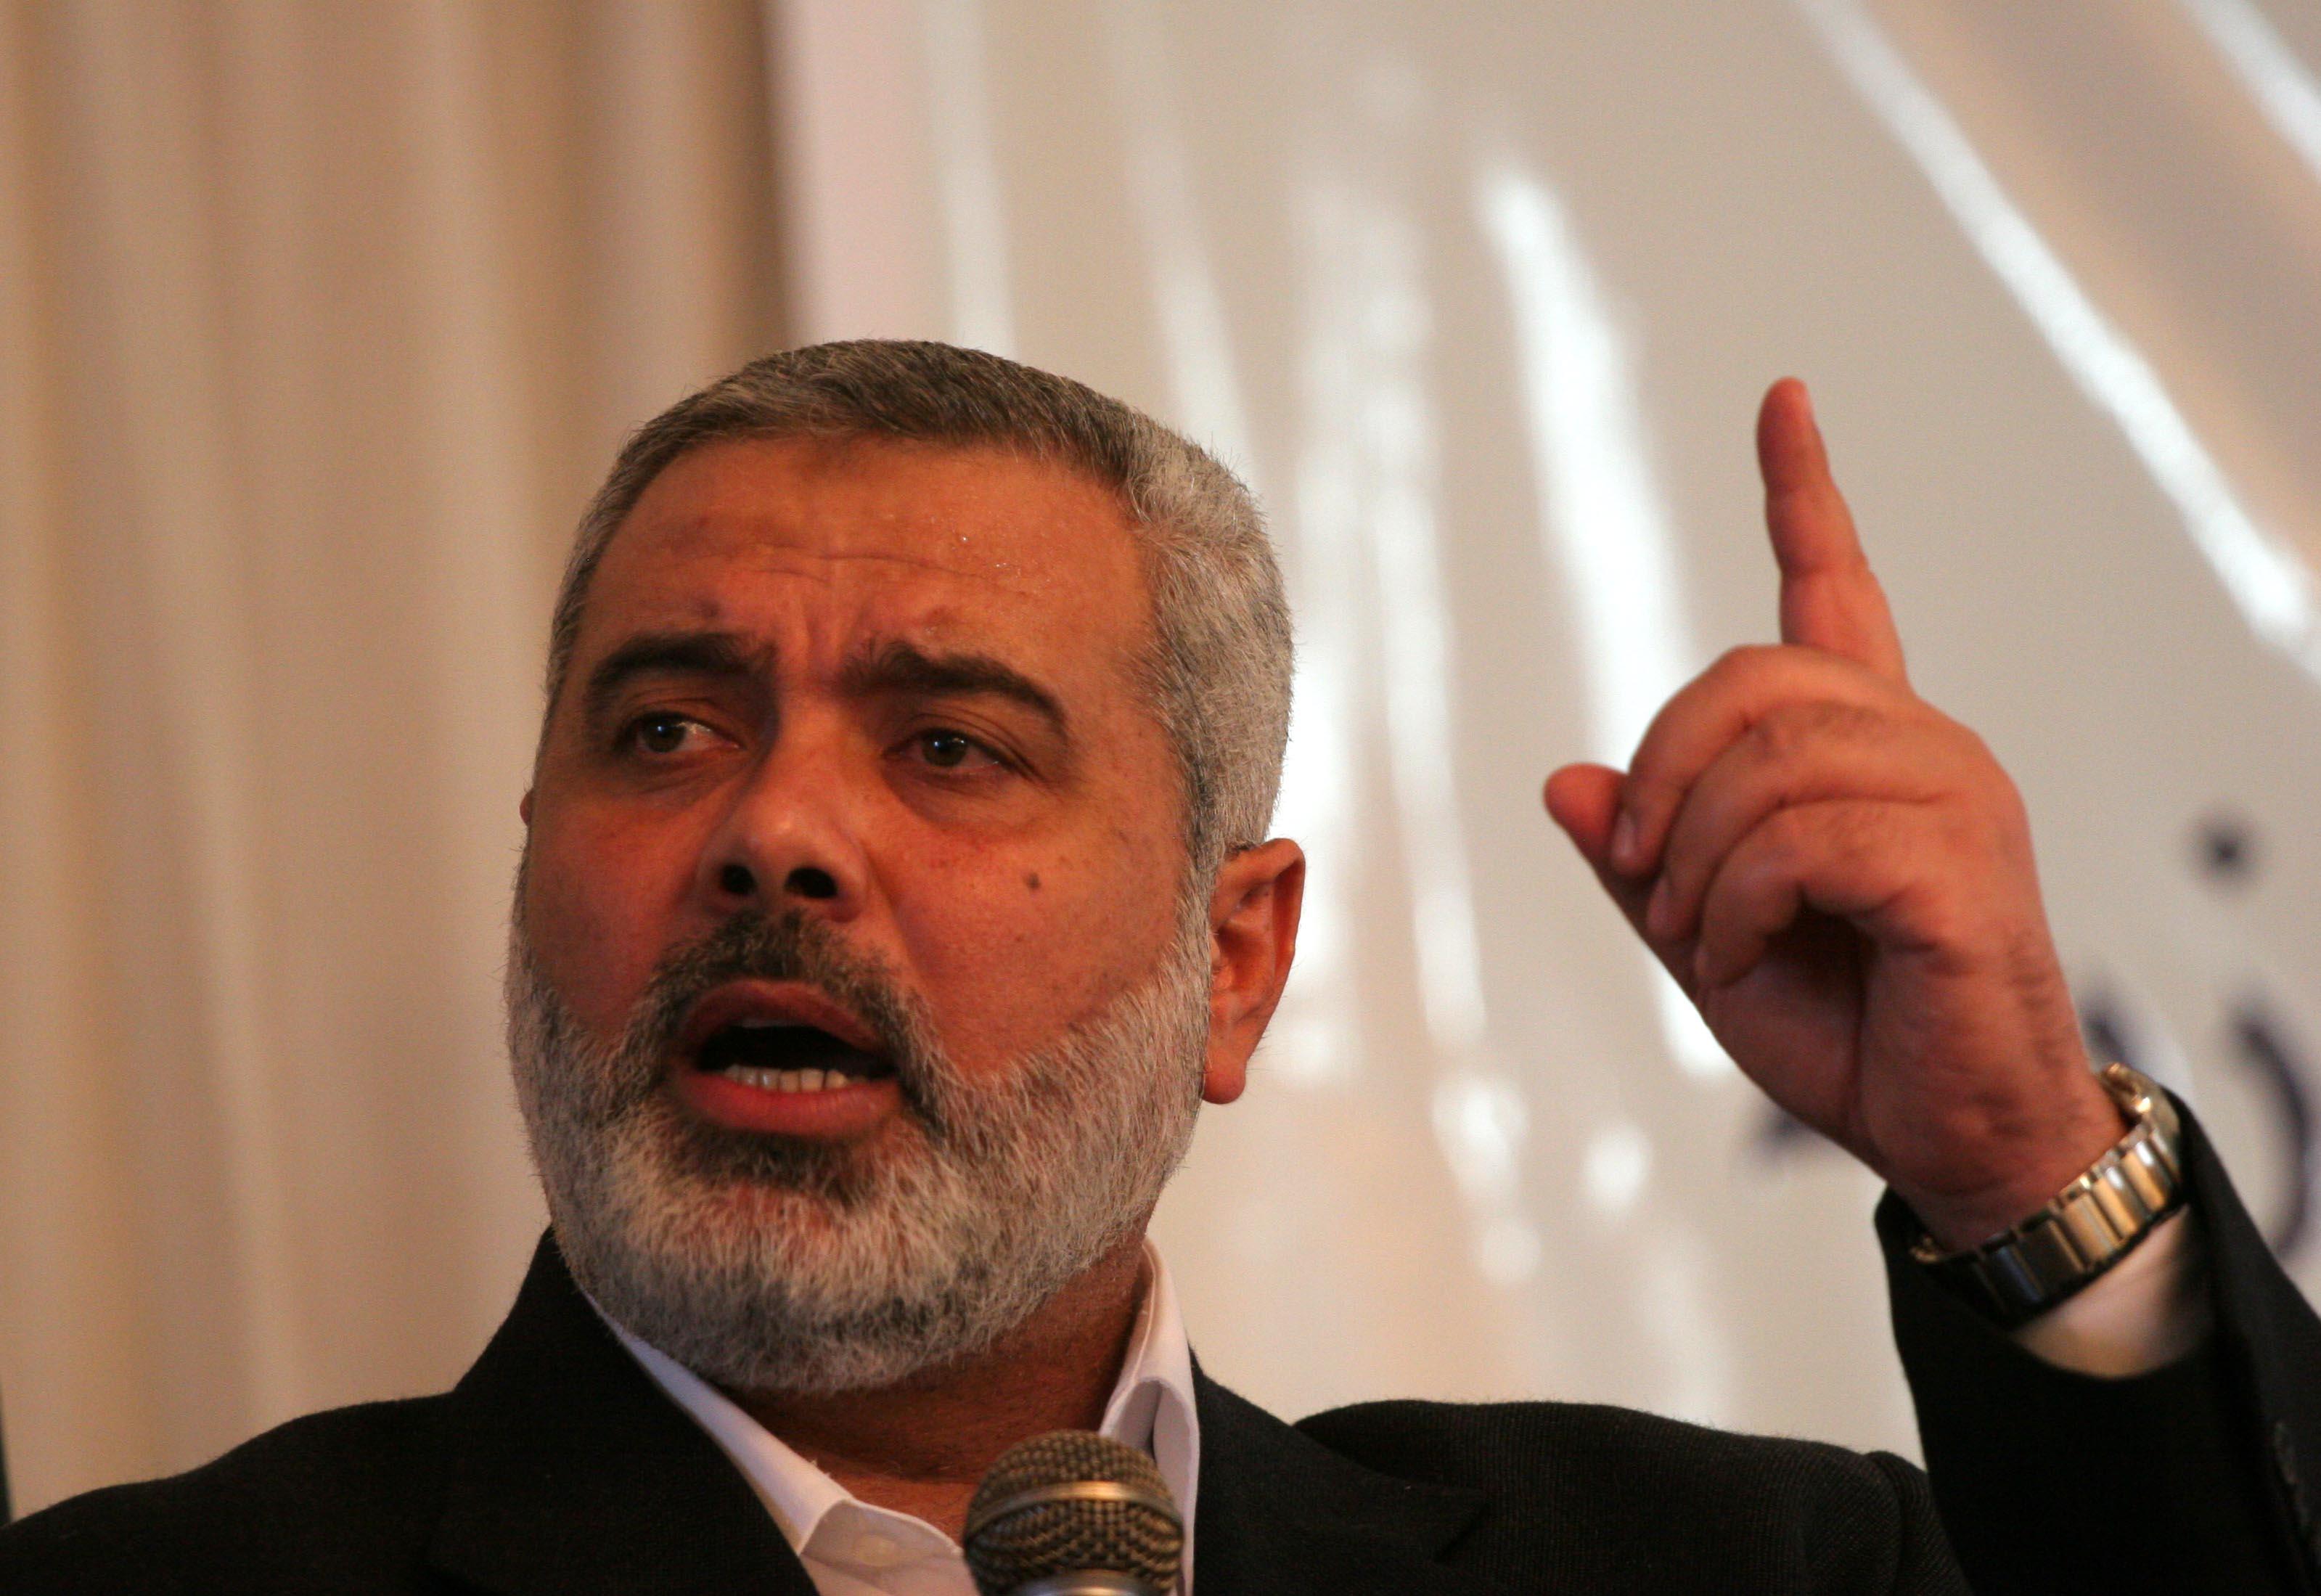 Head of Hamas's politburo Ismail Haniyeh